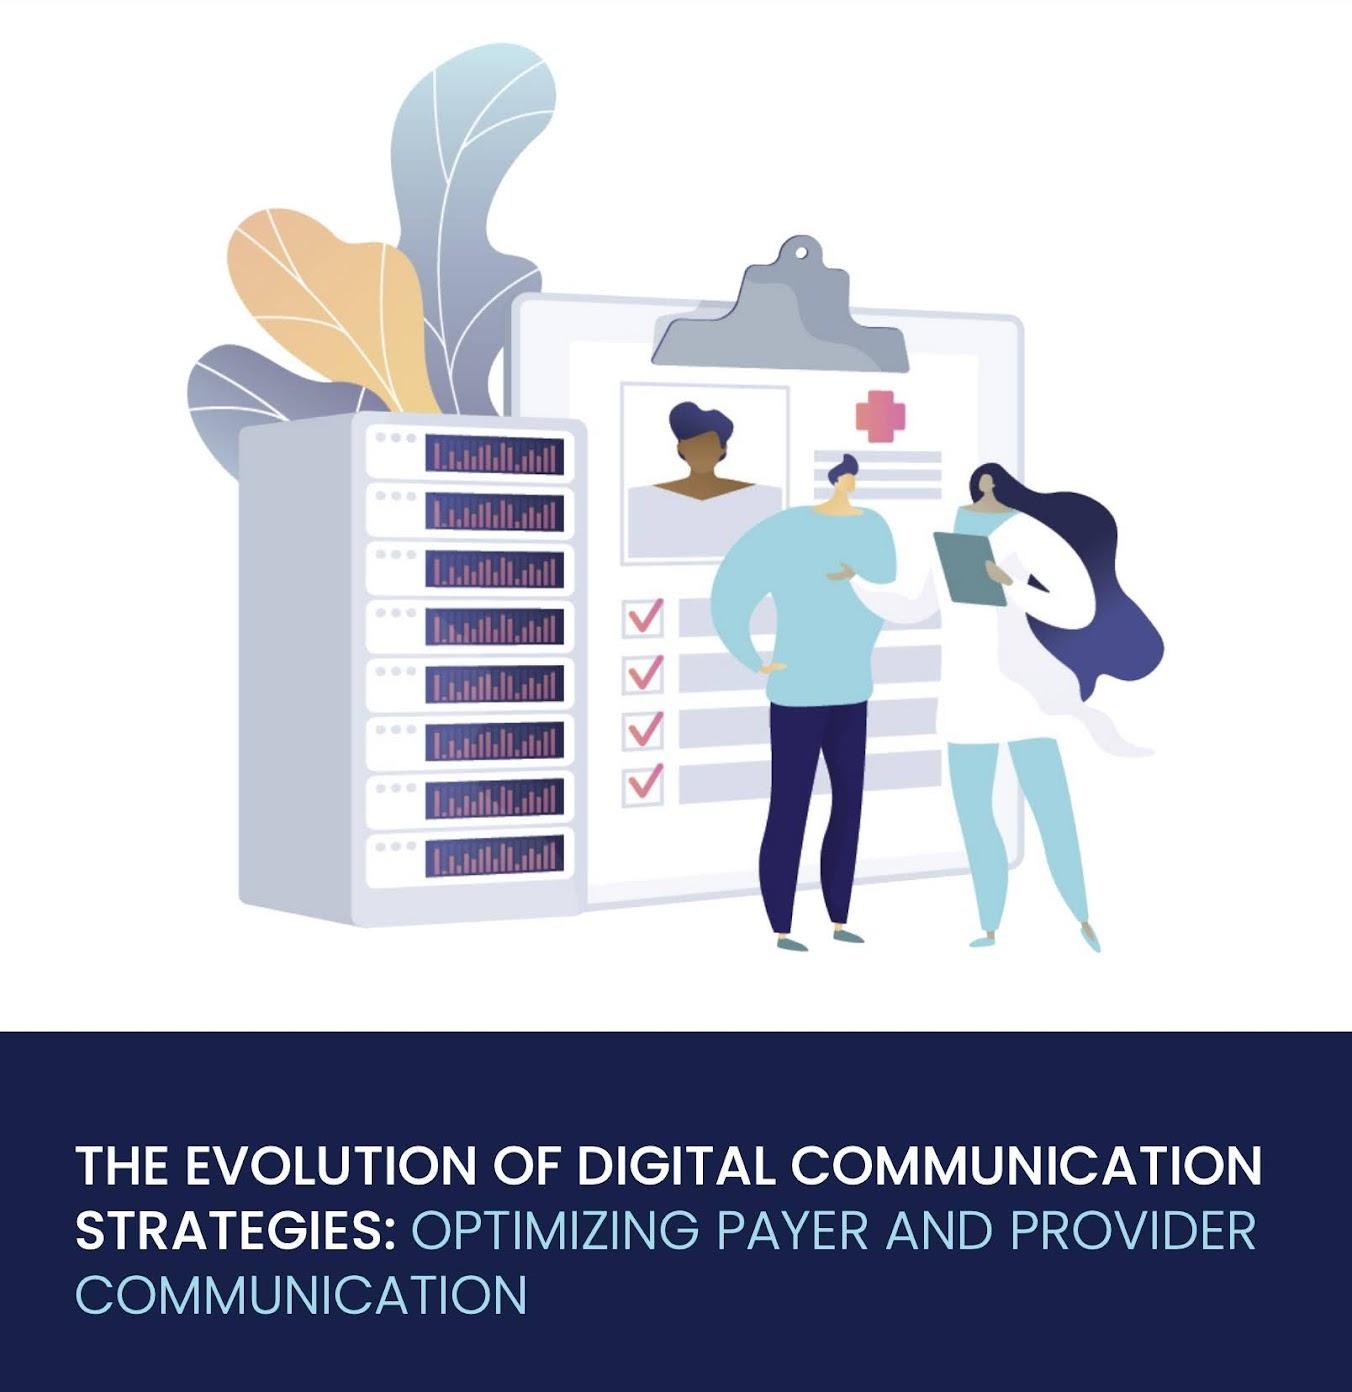 The Evolution of Digital Communication Strategies: Optimizing Payer and Provider Communication